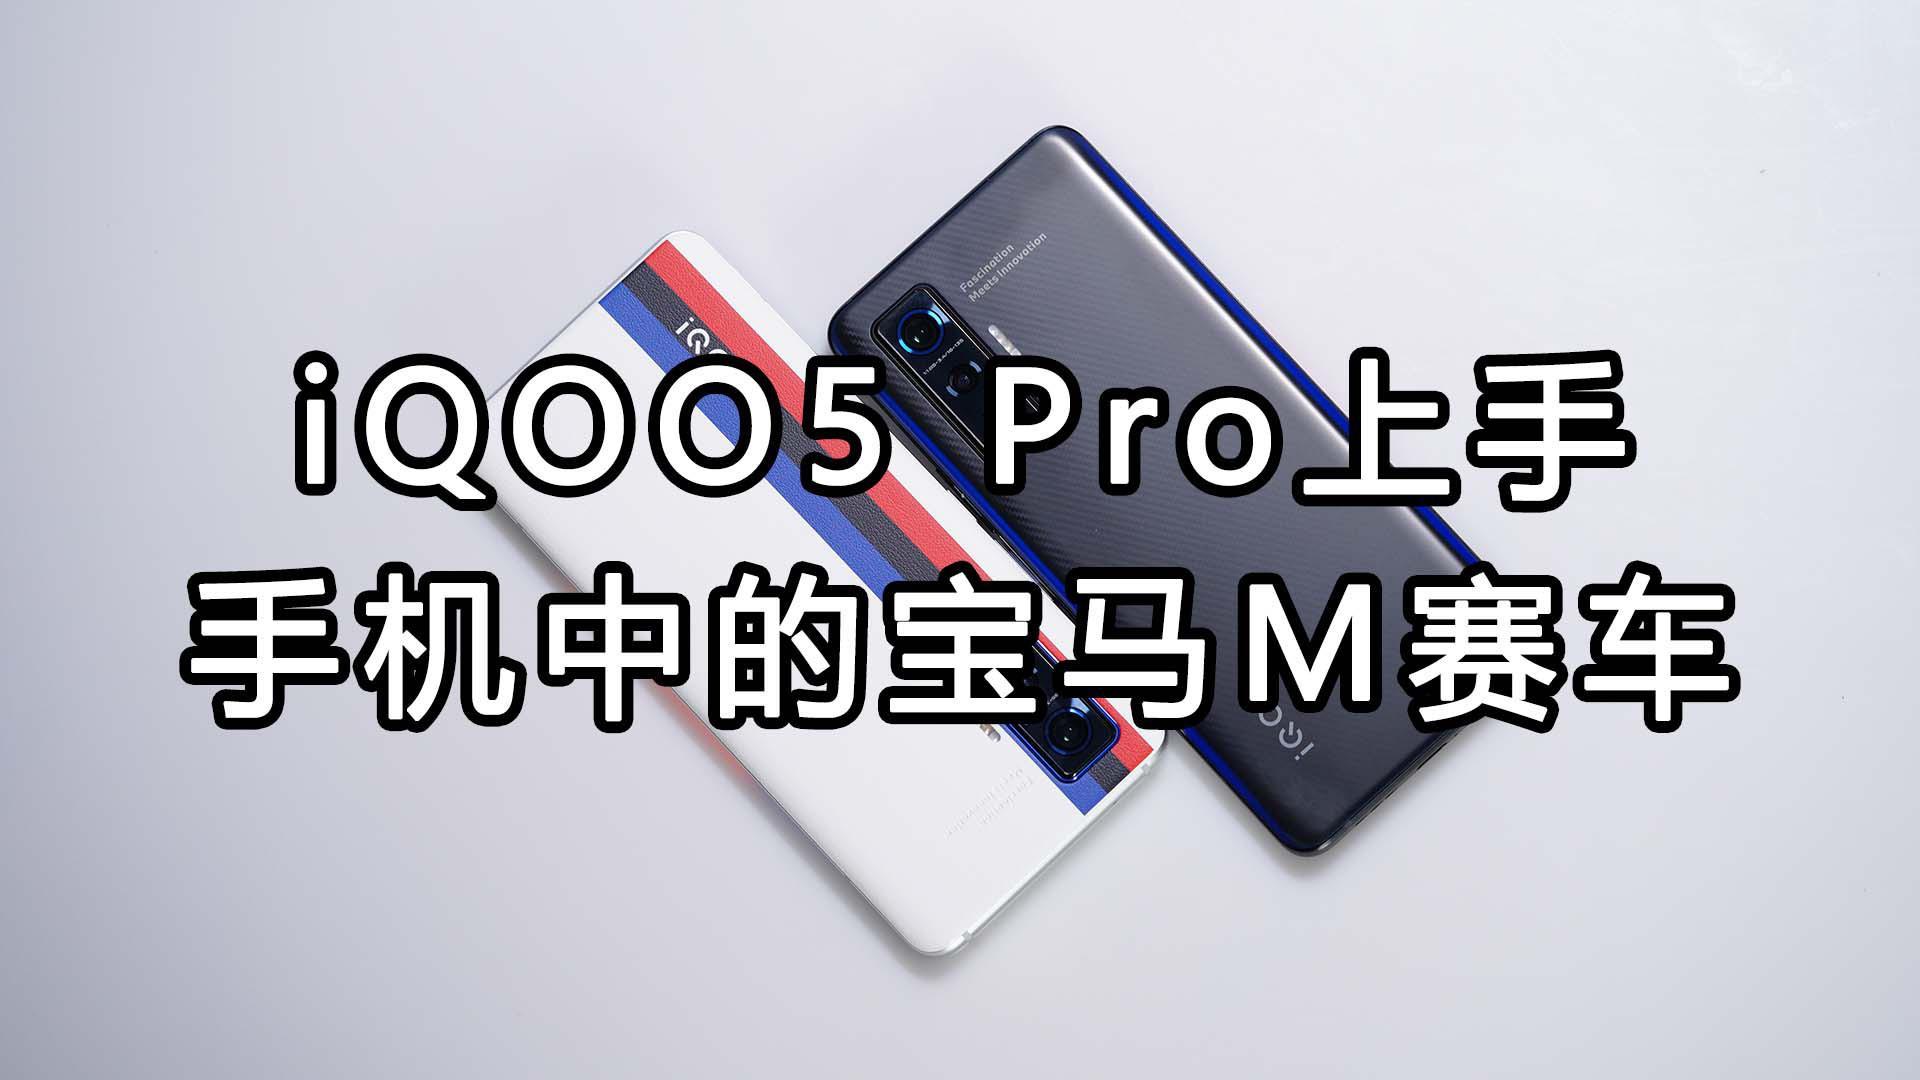 iQOO5 Pro上手:手机中的宝马M赛车